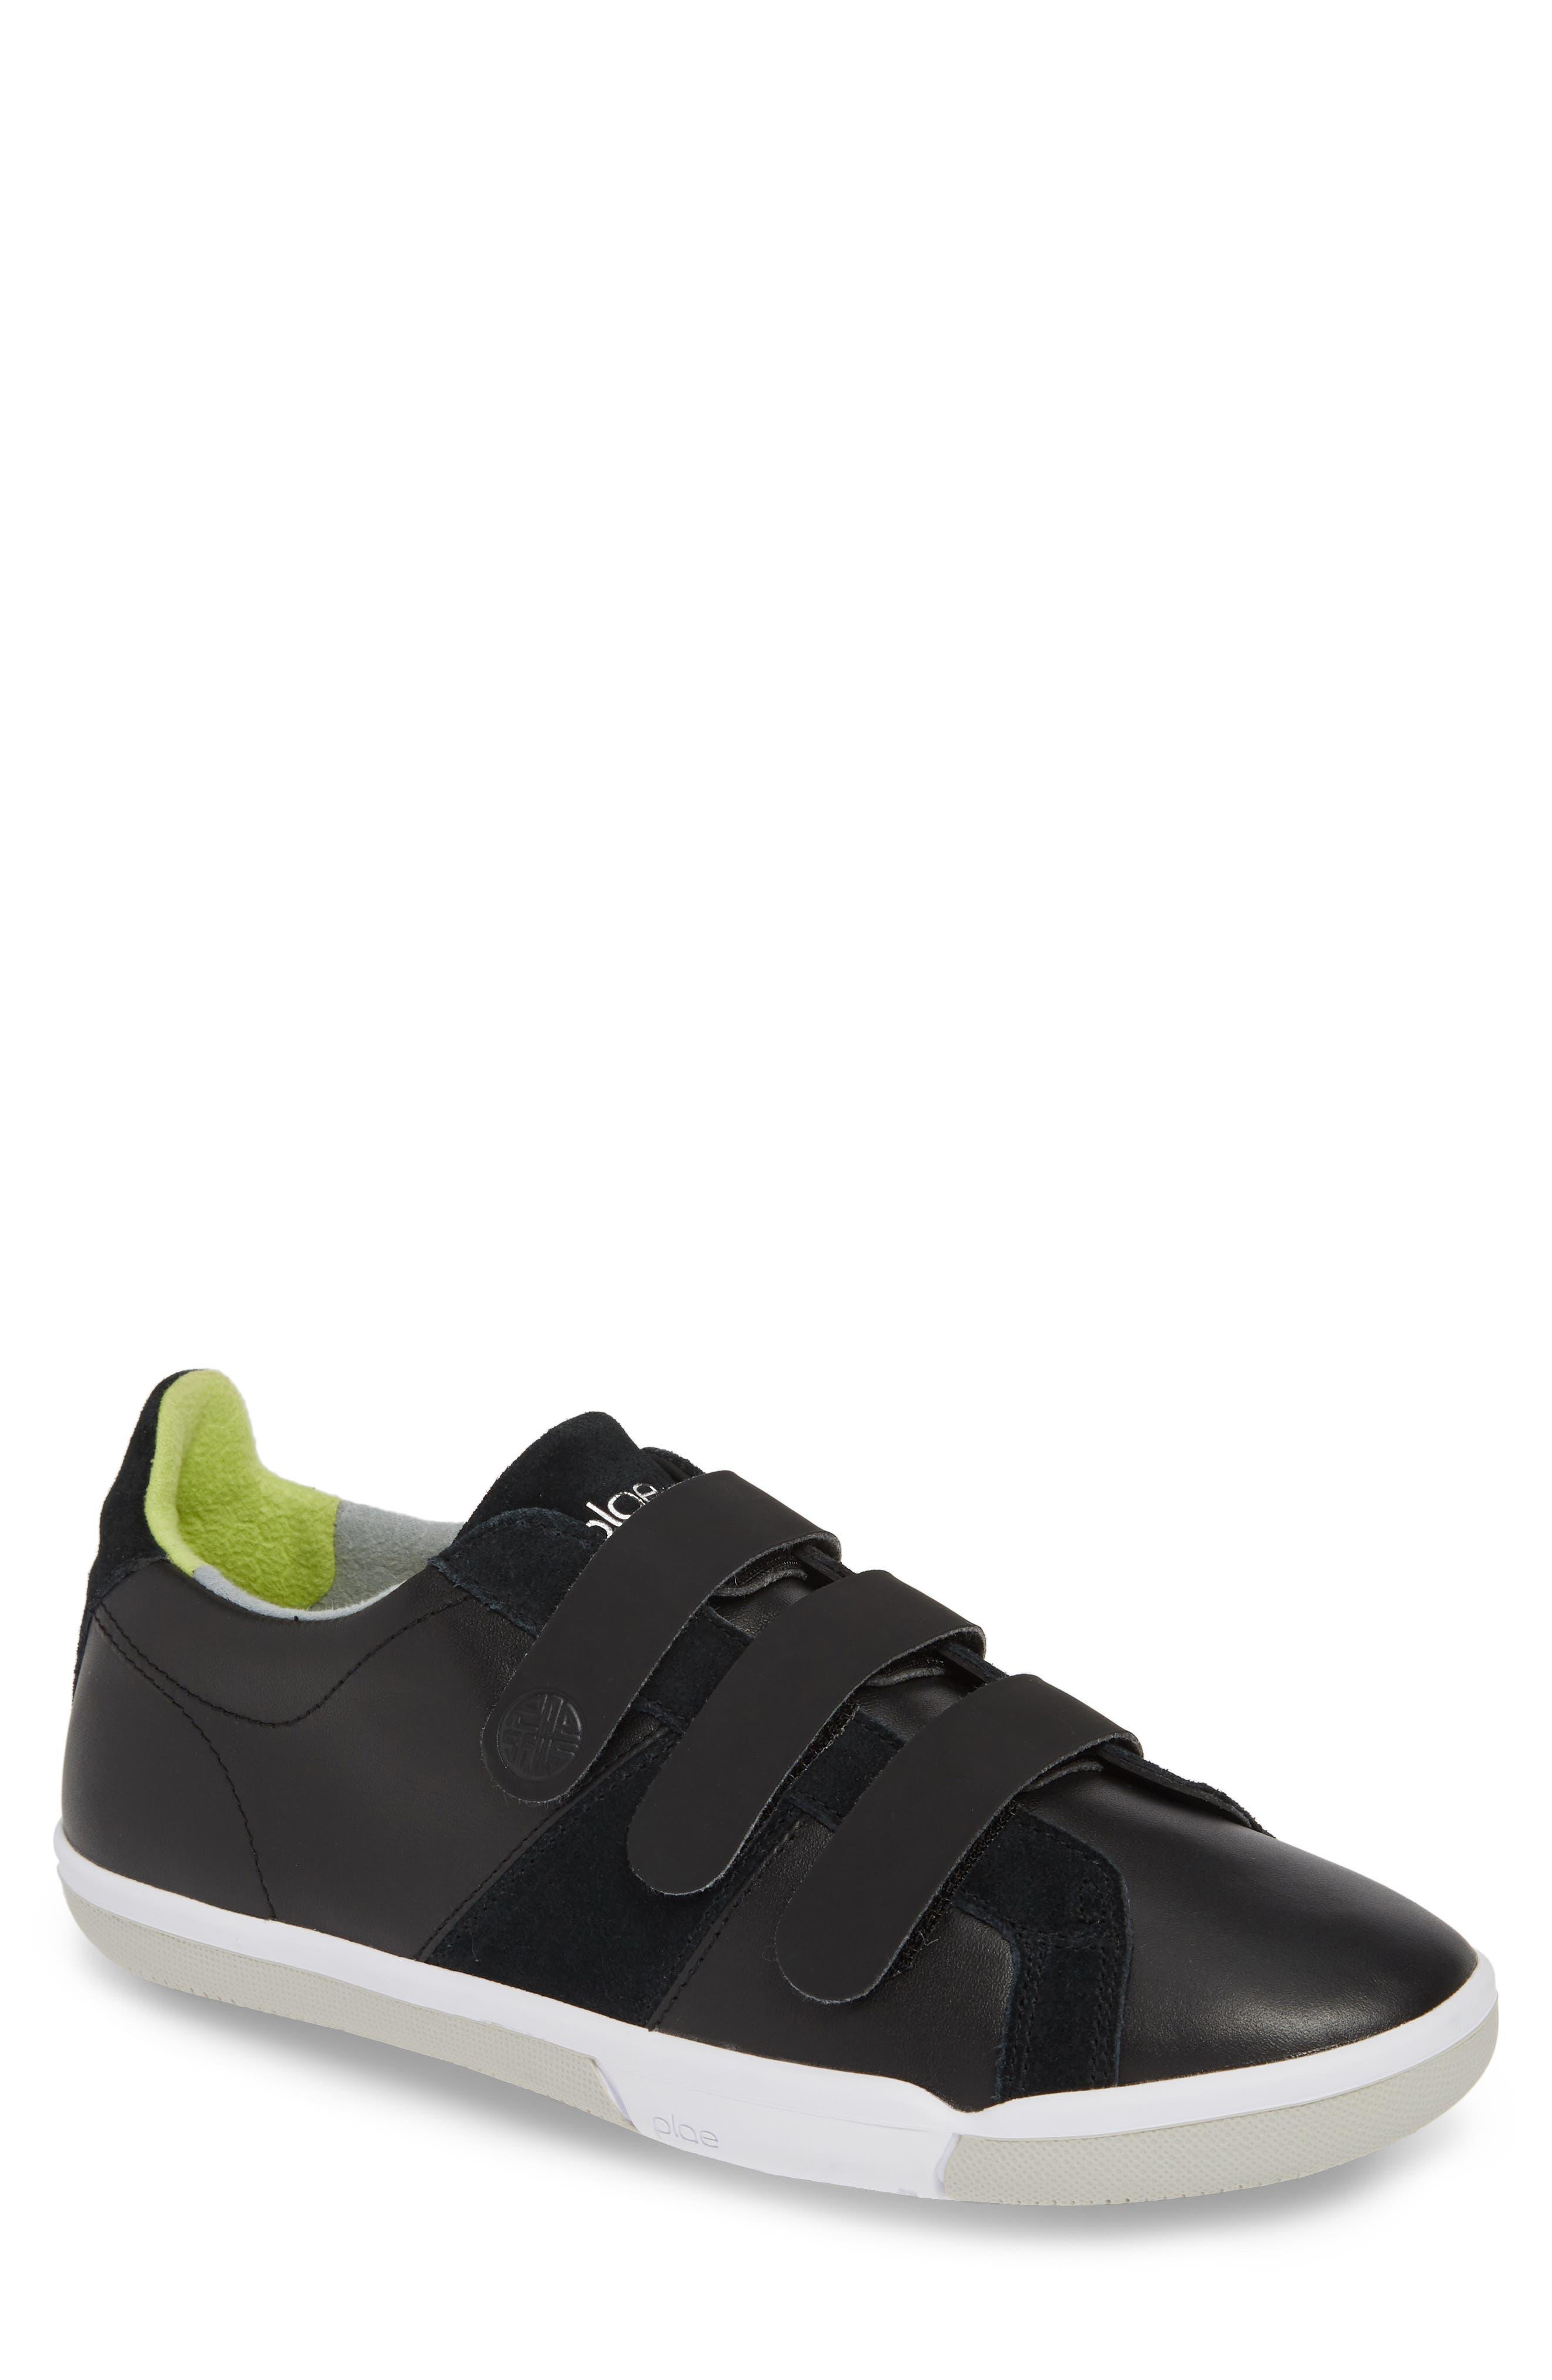 PLAE Larkin Low Top Sneaker, Main, color, BLACK LEATHER/ SUEDE